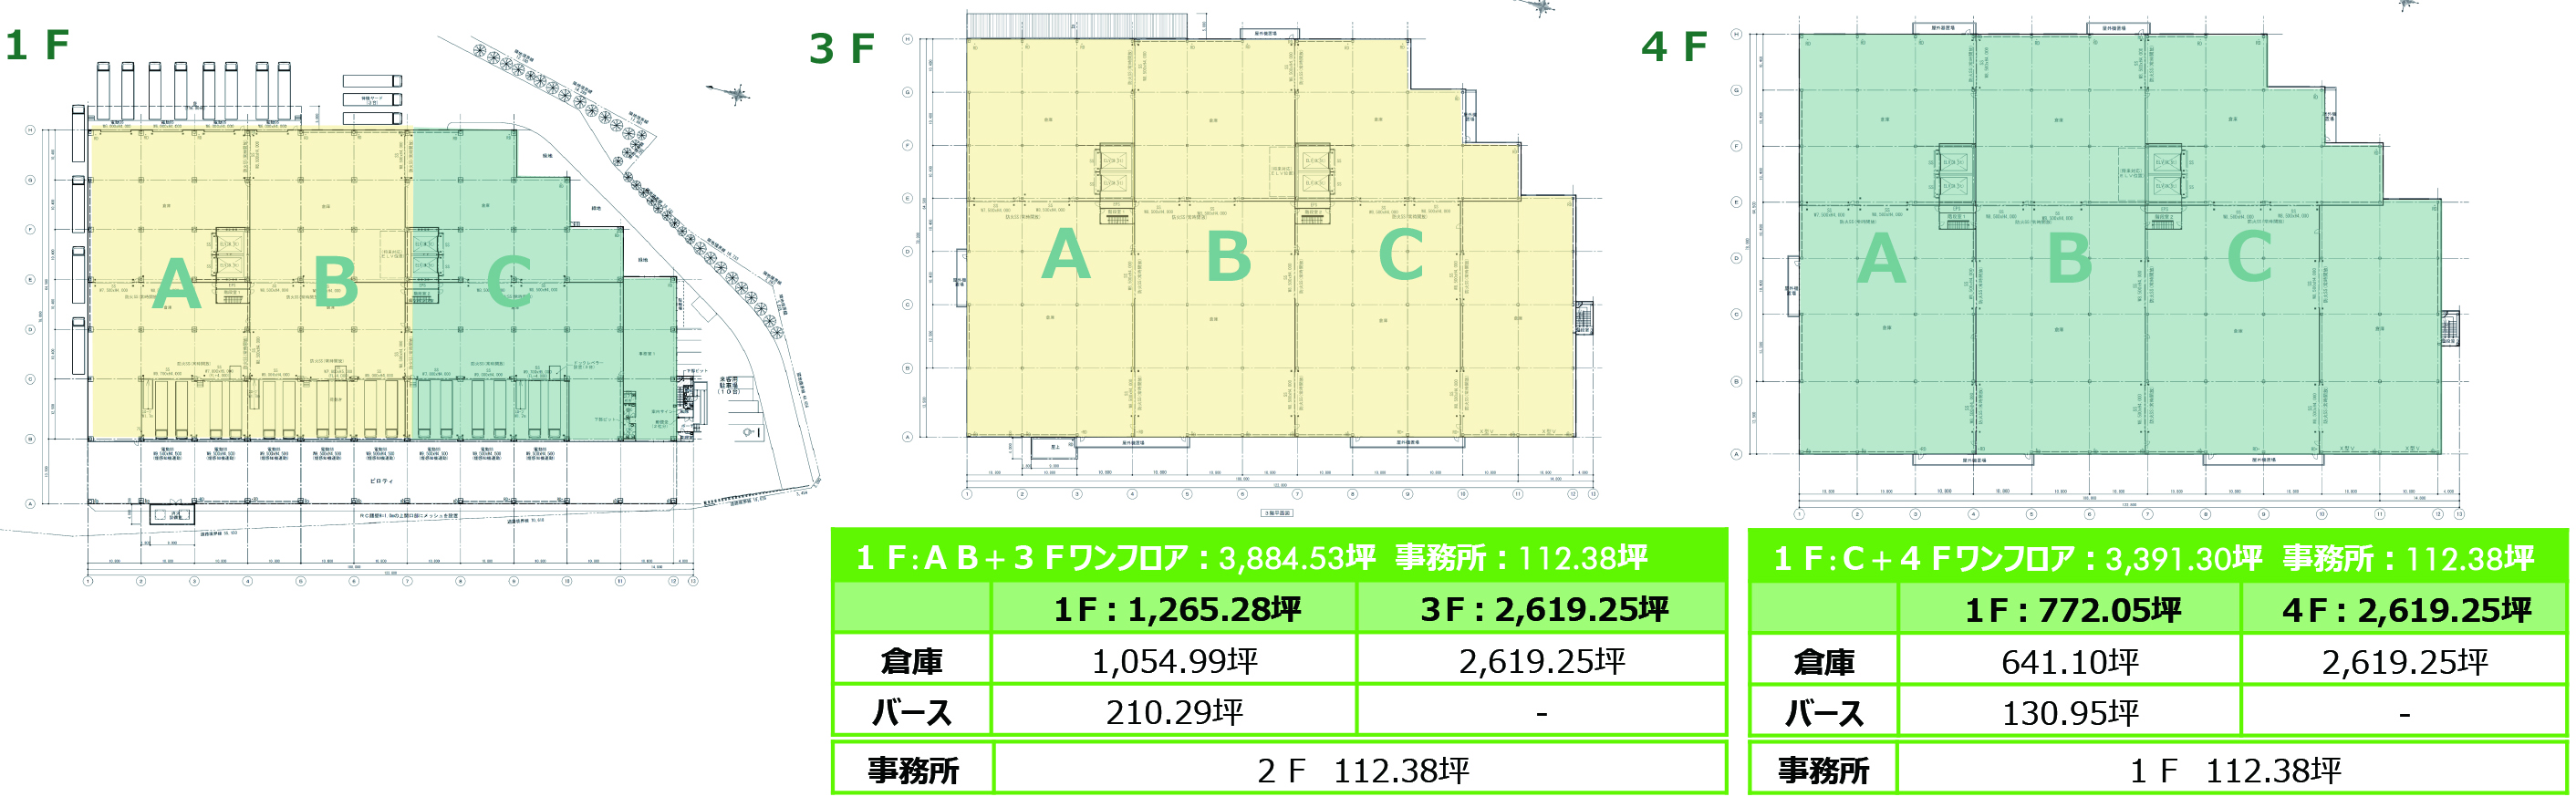 (仮称)札幌里塚物流センター